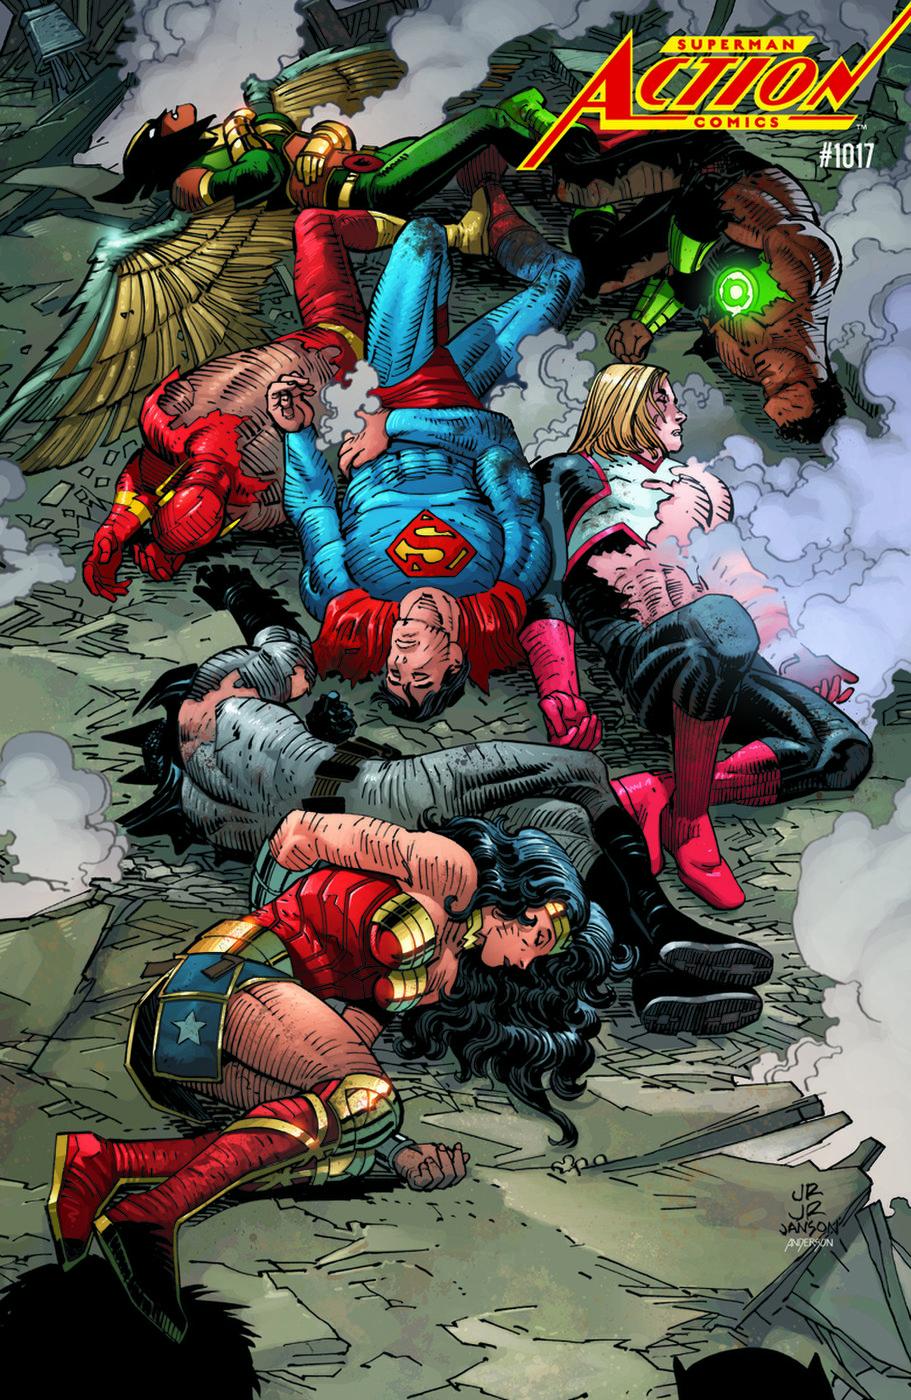 Action Comics Vol 1 1017 Acetate Variant.jpg